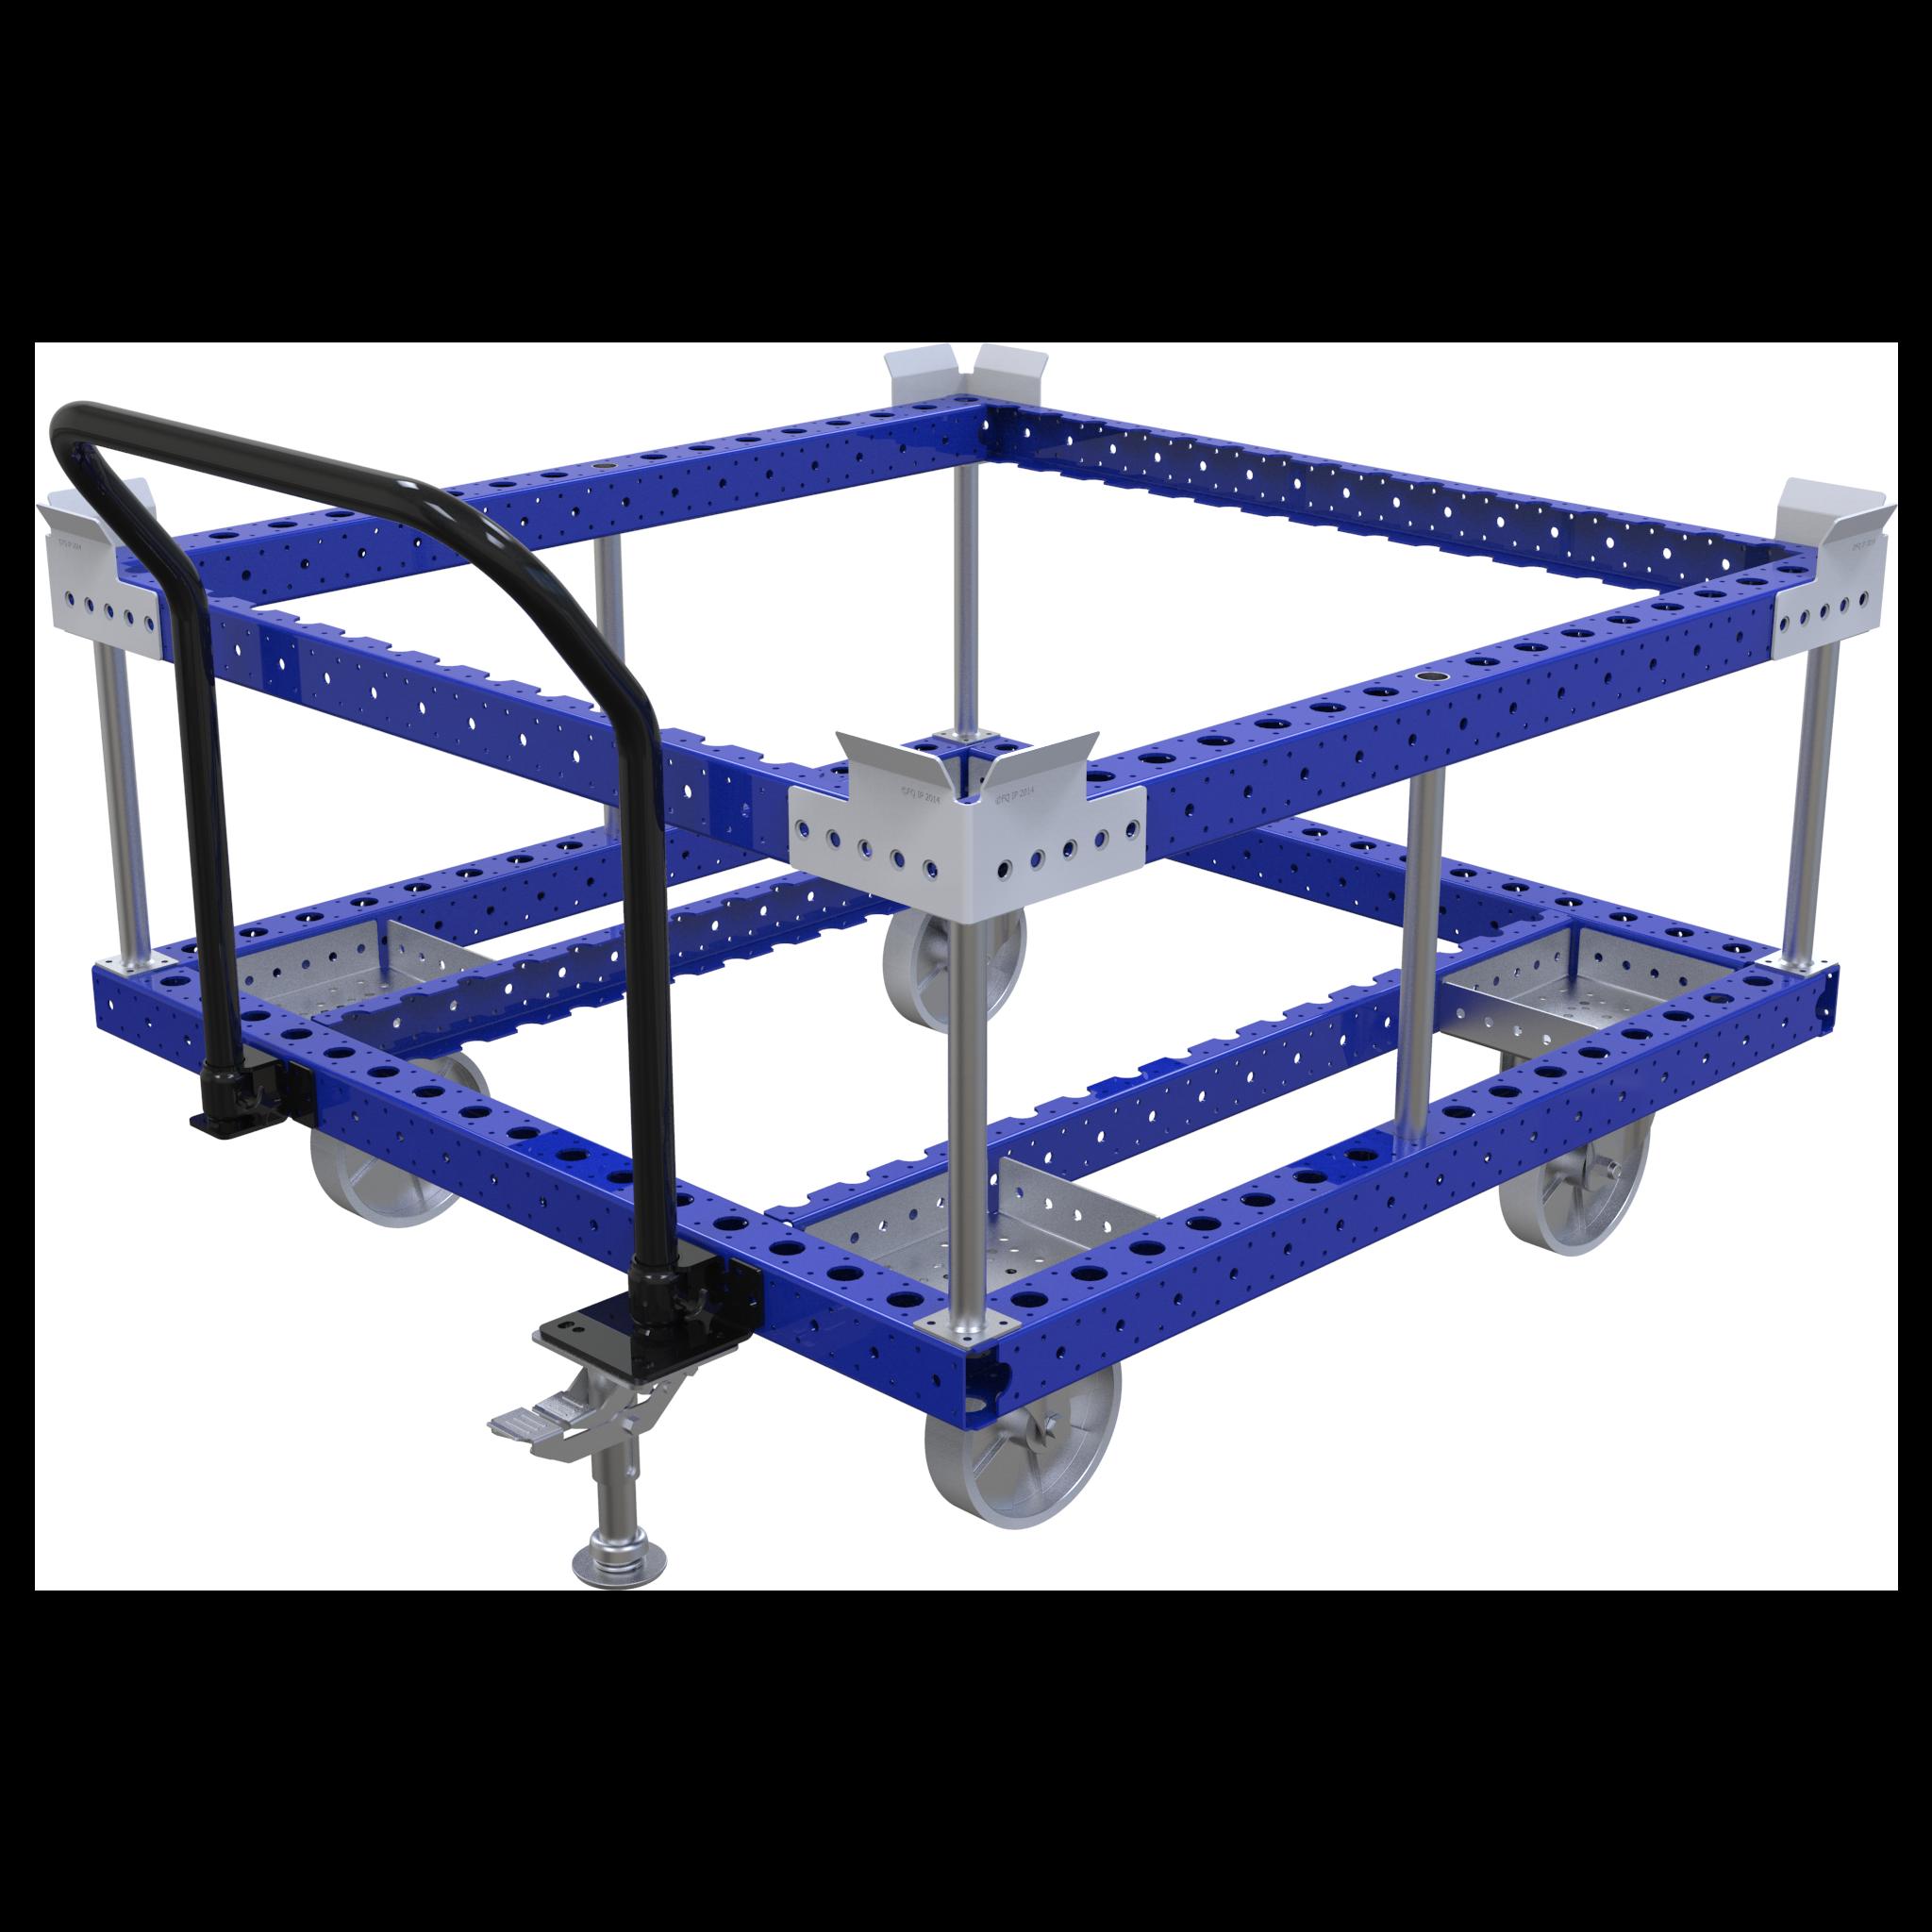 Raised Pallet Push Cart - 1260 x 1260 mm